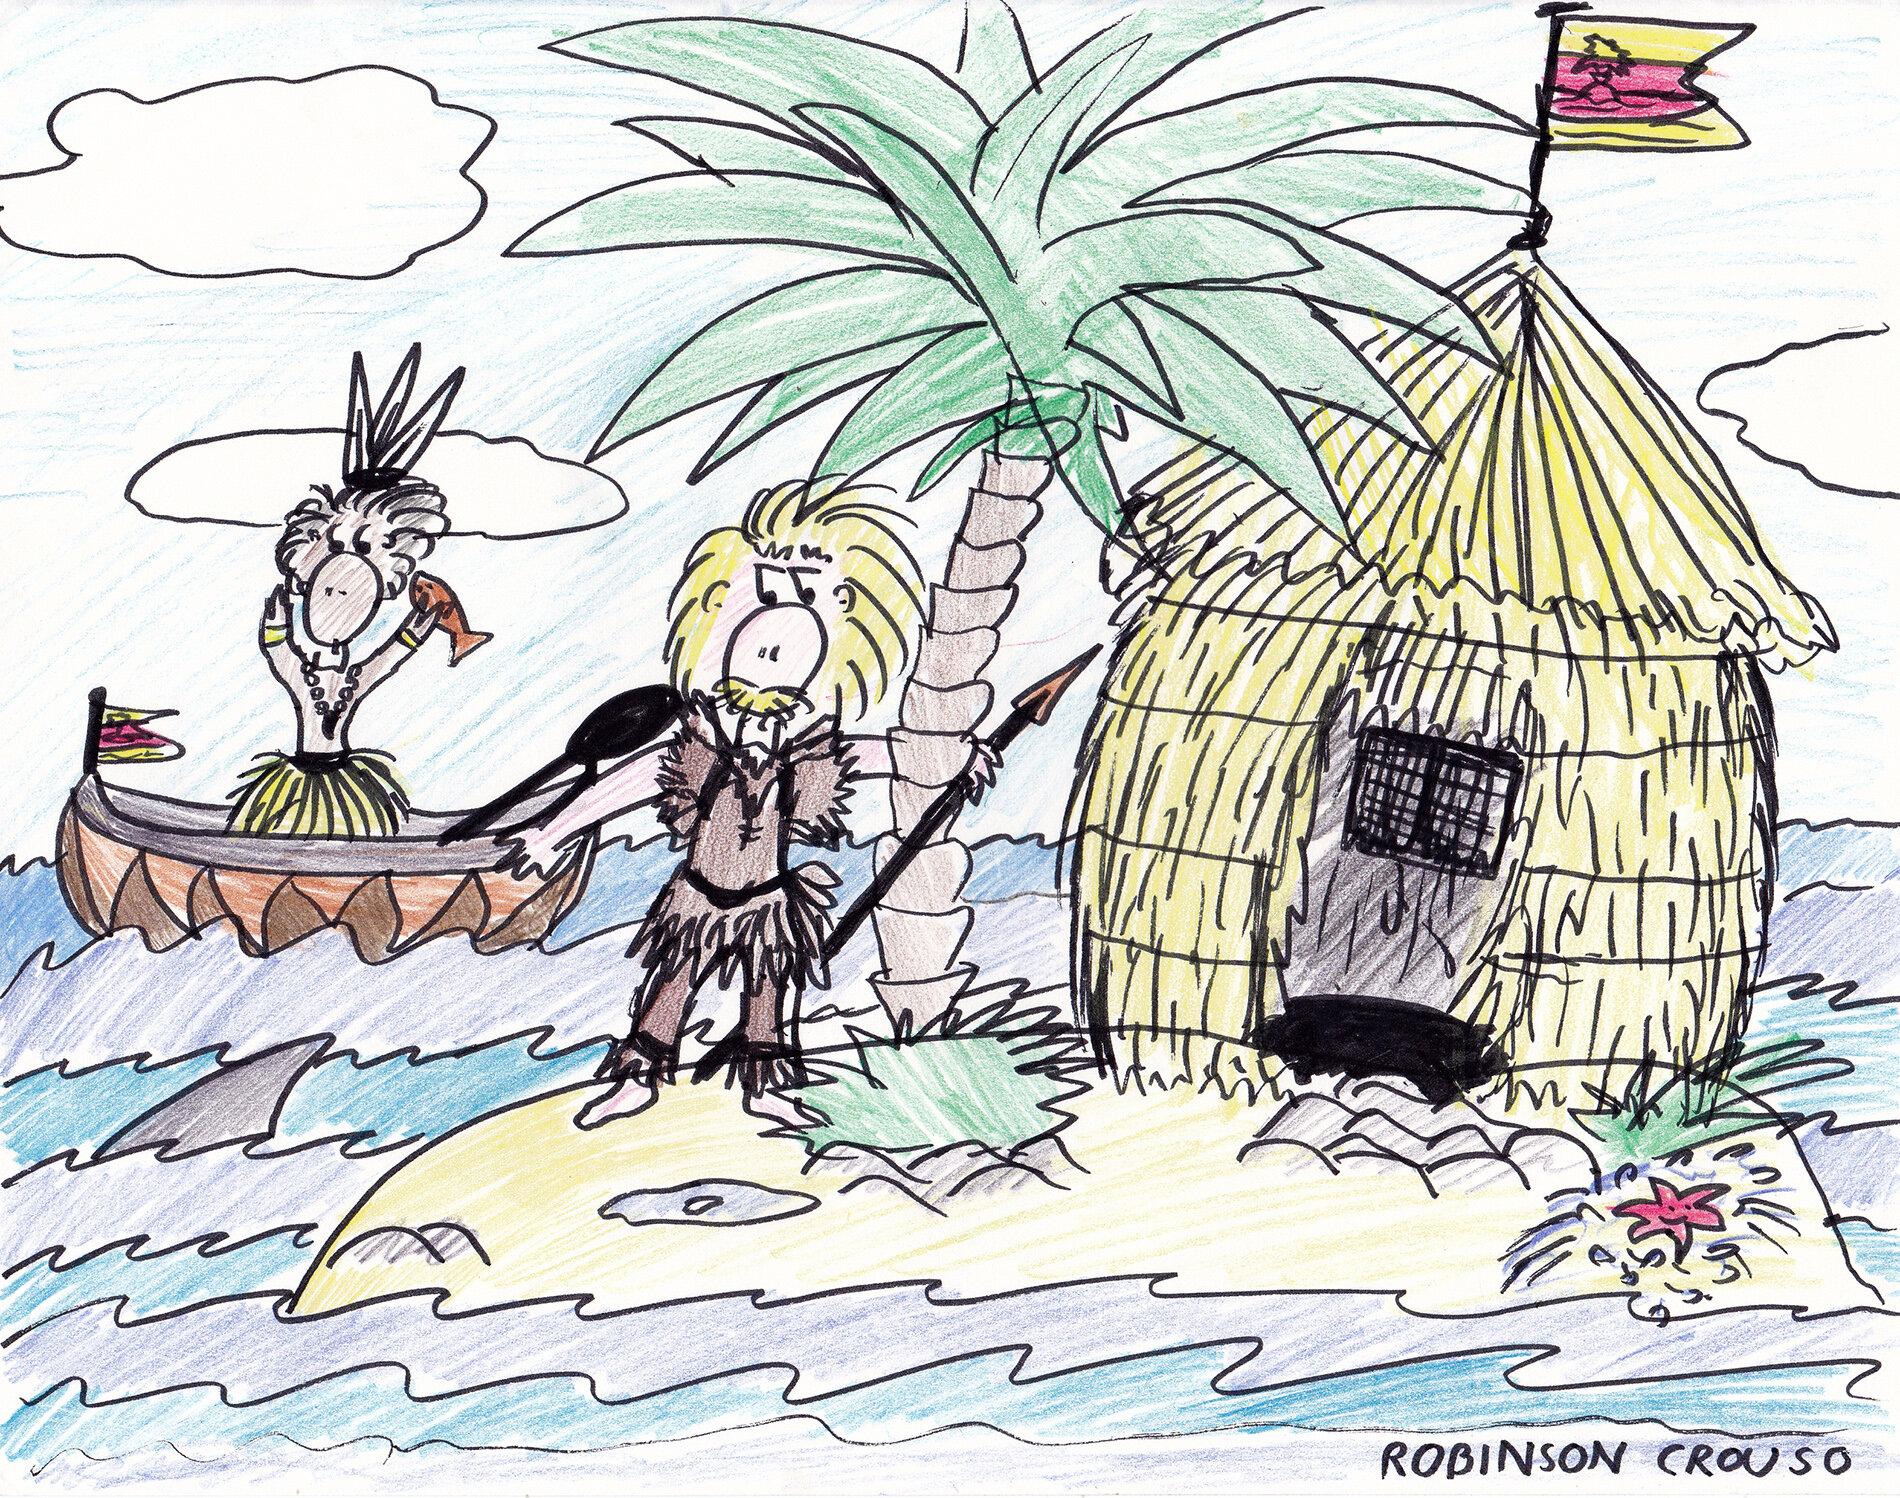 Robinson Crusoe (1994/95)